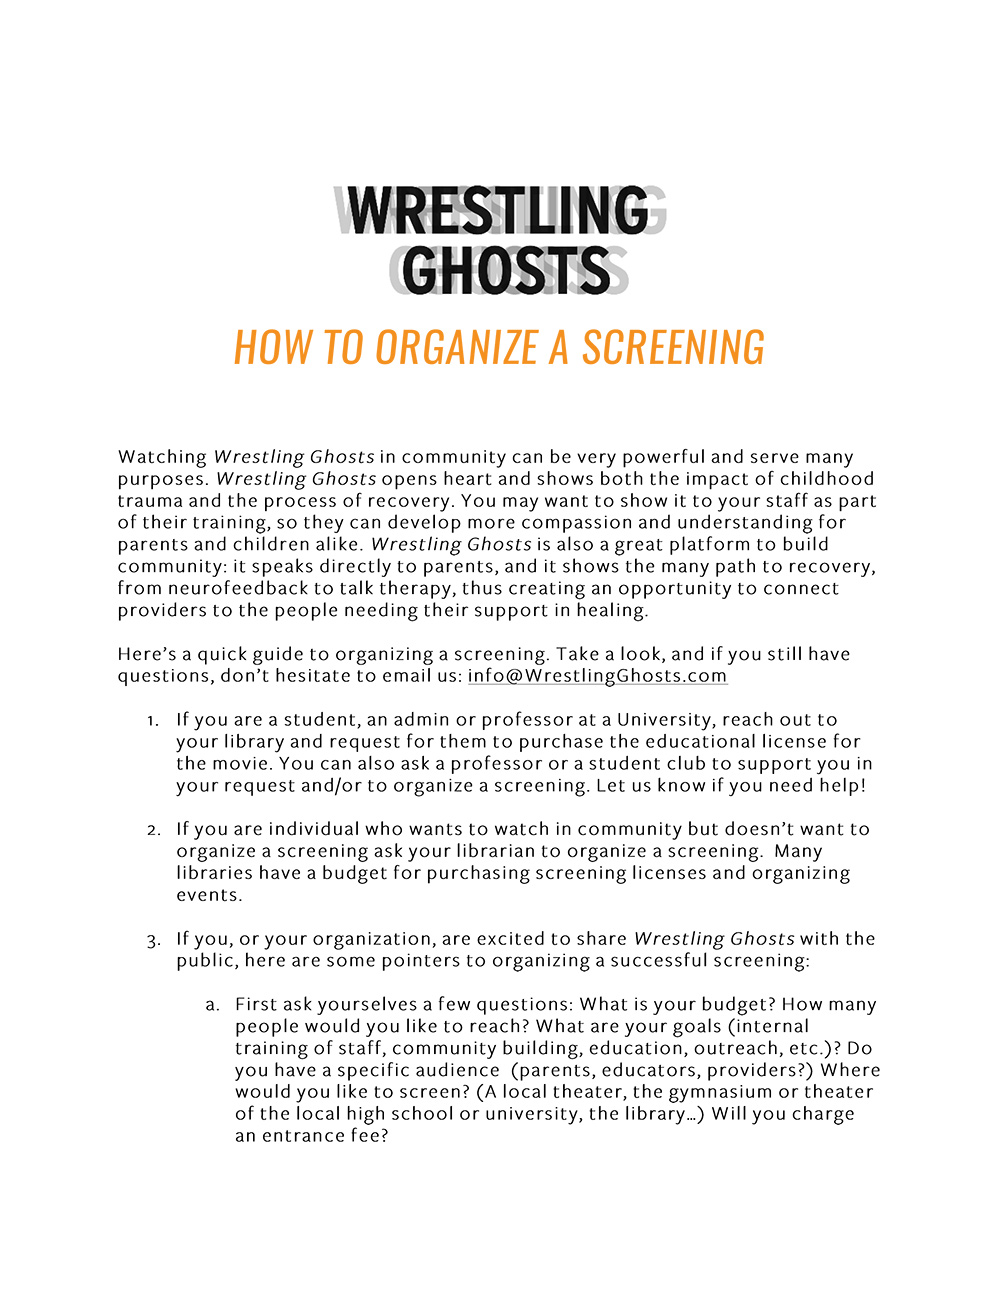 WG_ORGANIZE-SCREENING-1.jpg